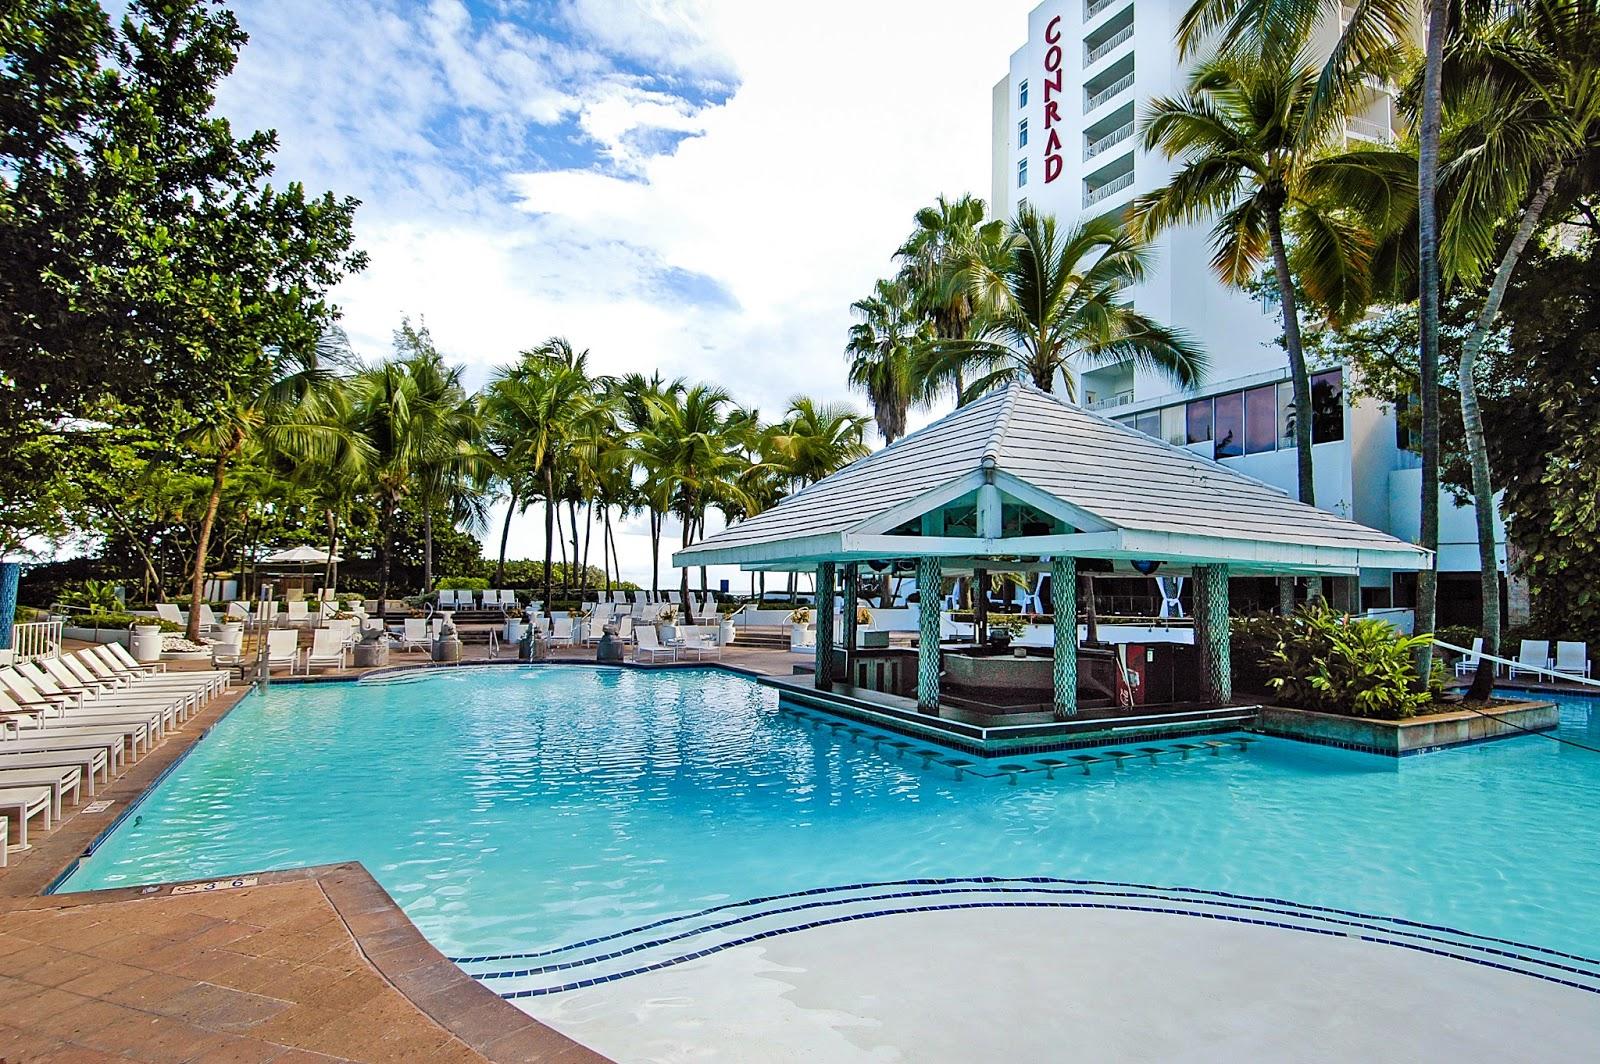 Conrad Hotel San Juan